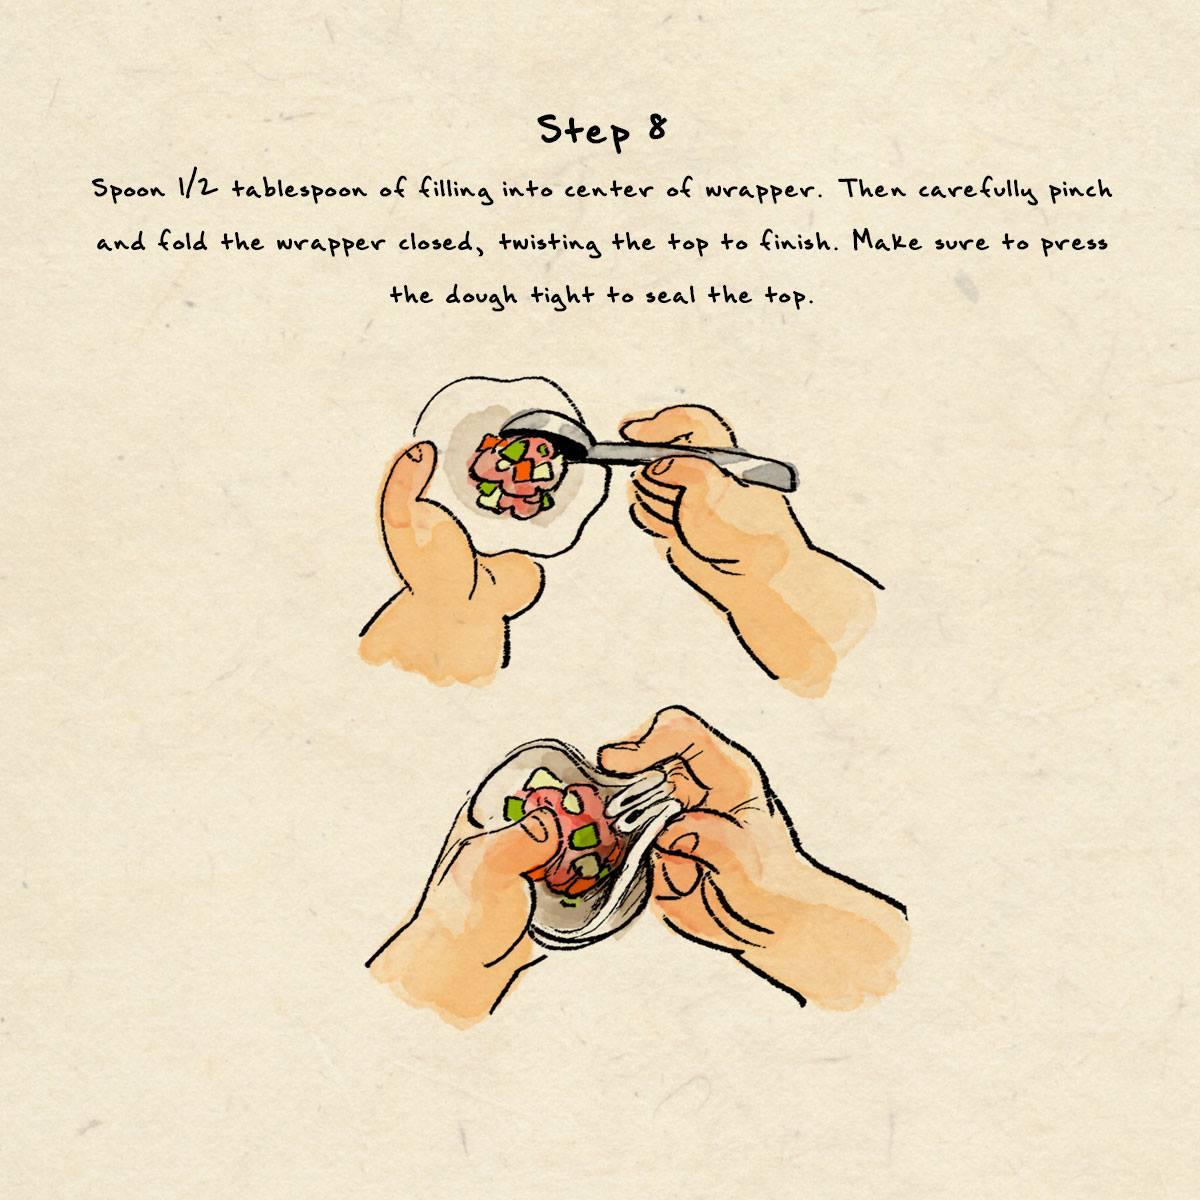 step 8 dumpling recipe